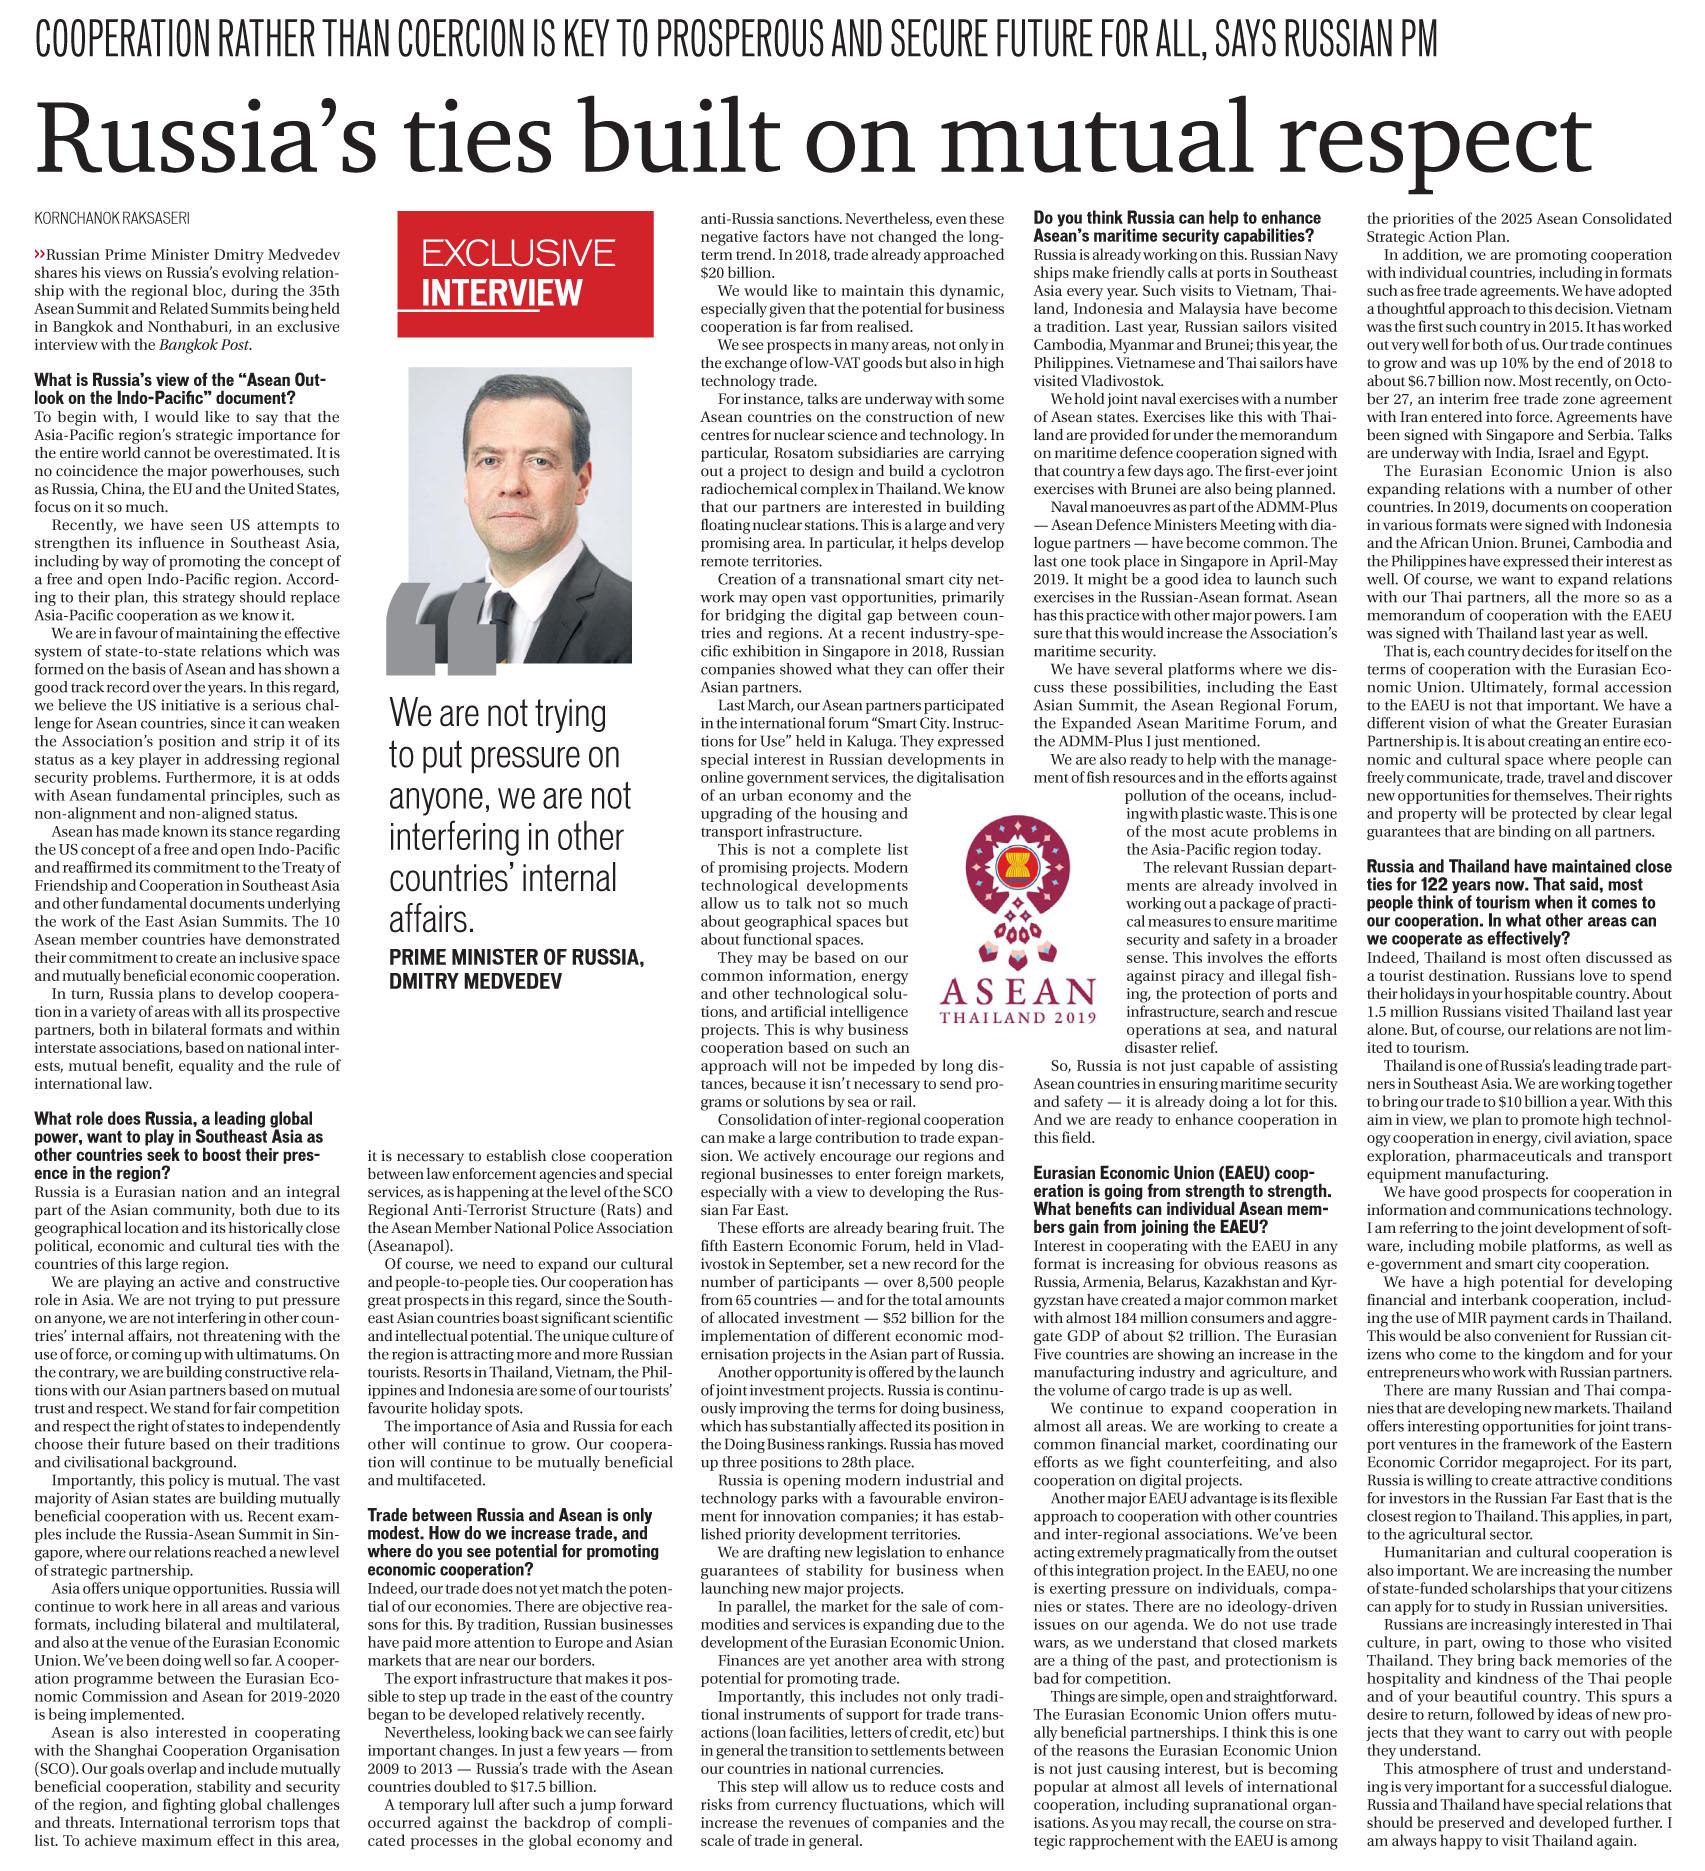 Bangkok Post 2019-11-03 Medvedev.jpg